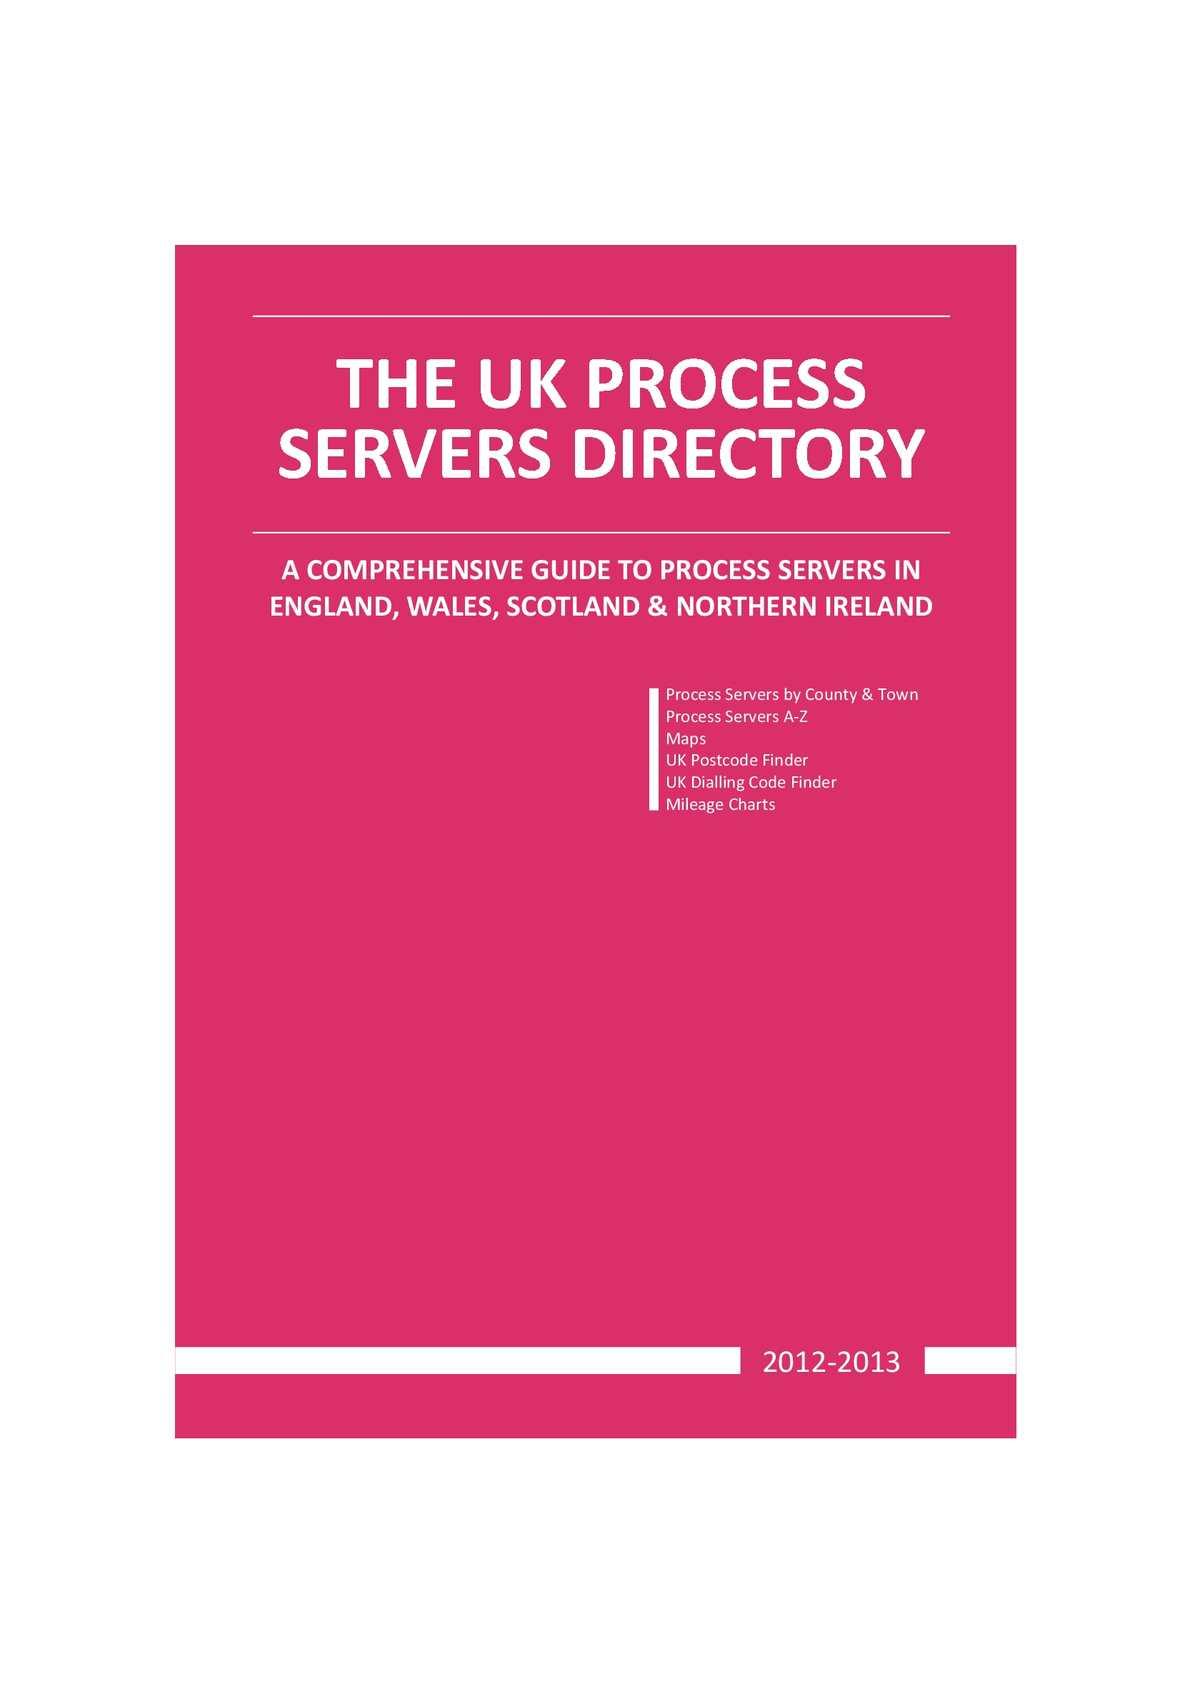 2a009dec8ca Calaméo - UK Process Servers Directory 2012-2013